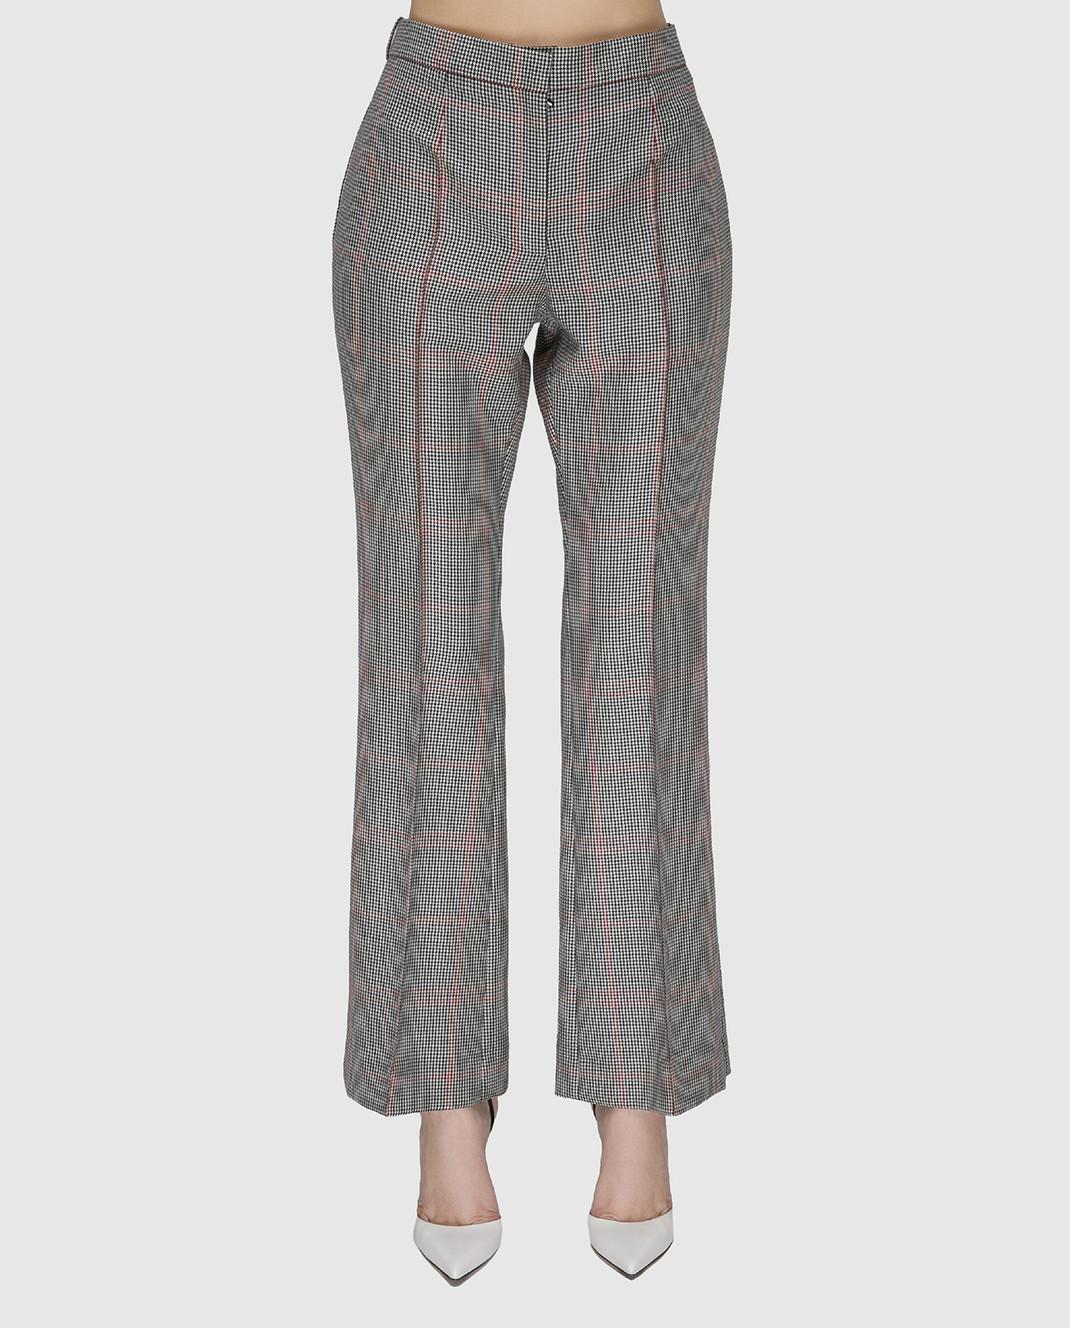 NINA RICCI Серые брюки 17ECPA018WV0211 изображение 3